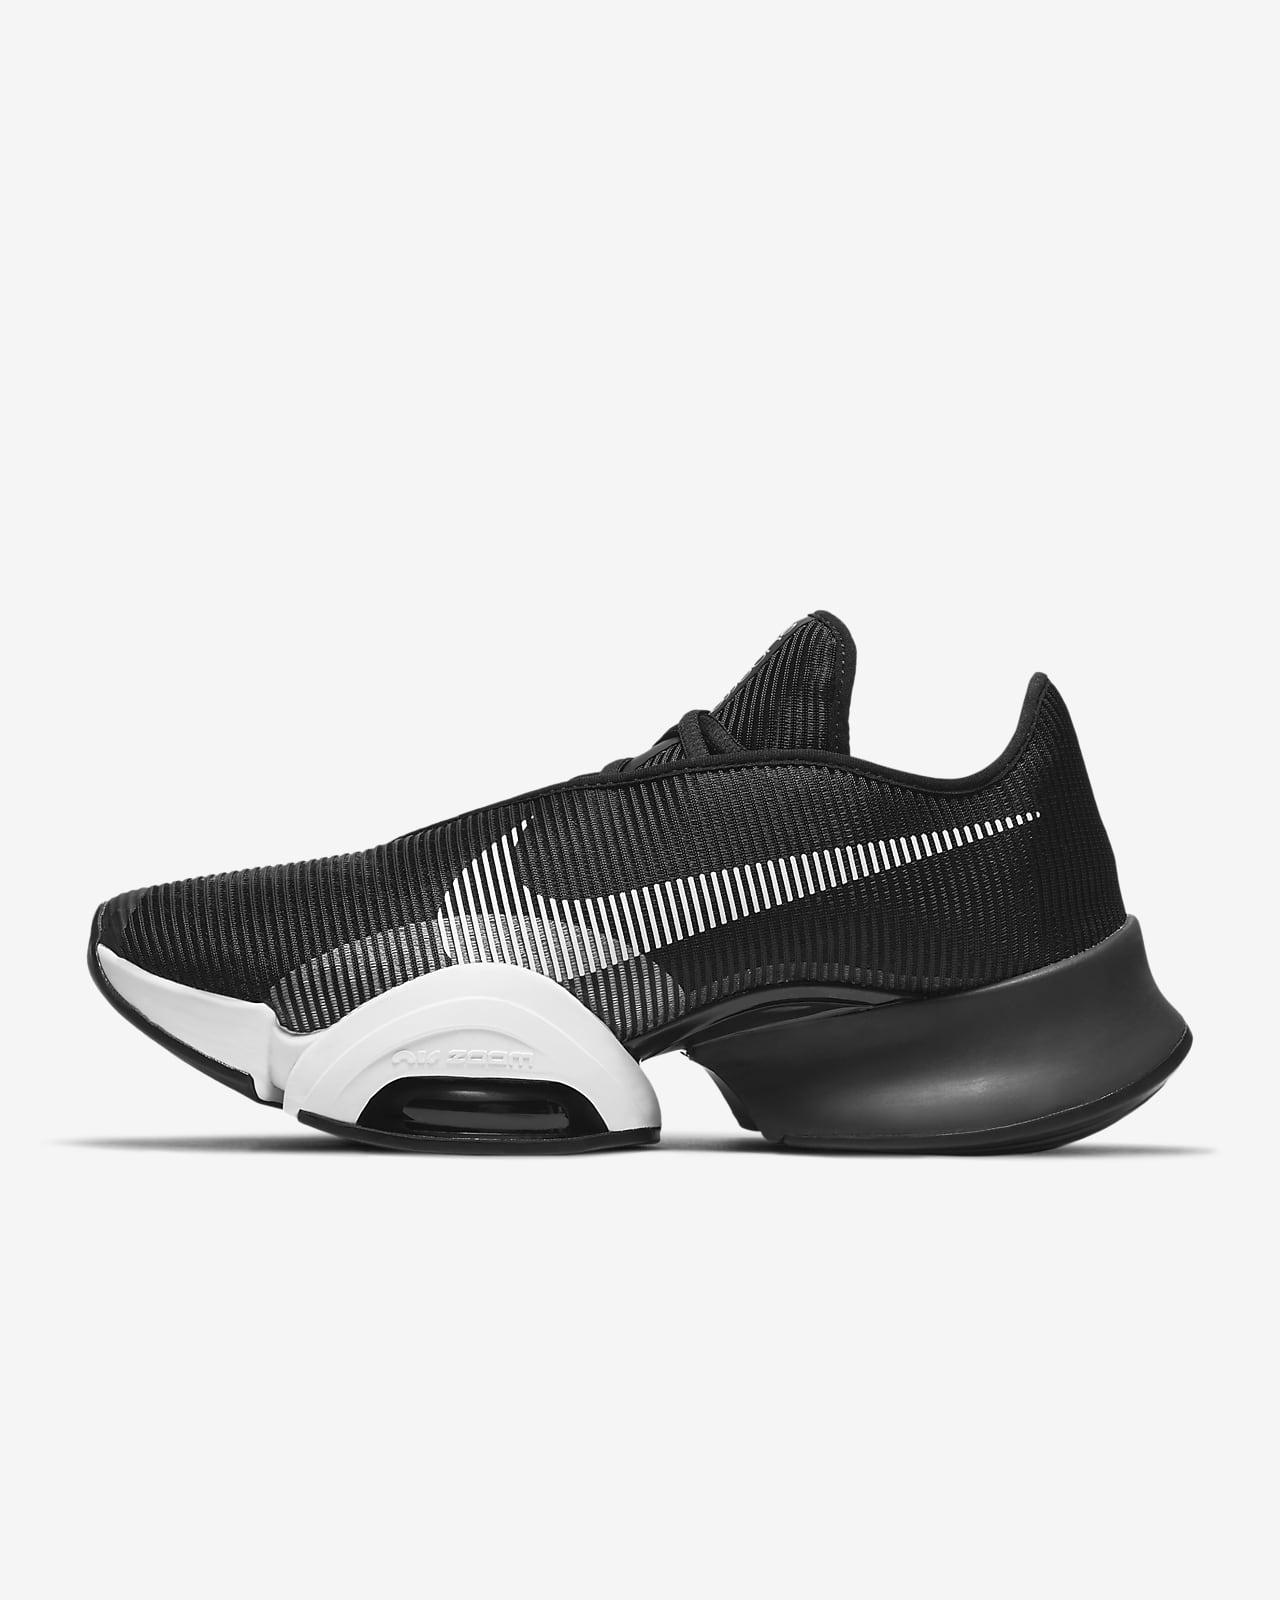 Pánská bota Nike Air Zoom SuperRep 2 na HIIT tréninky